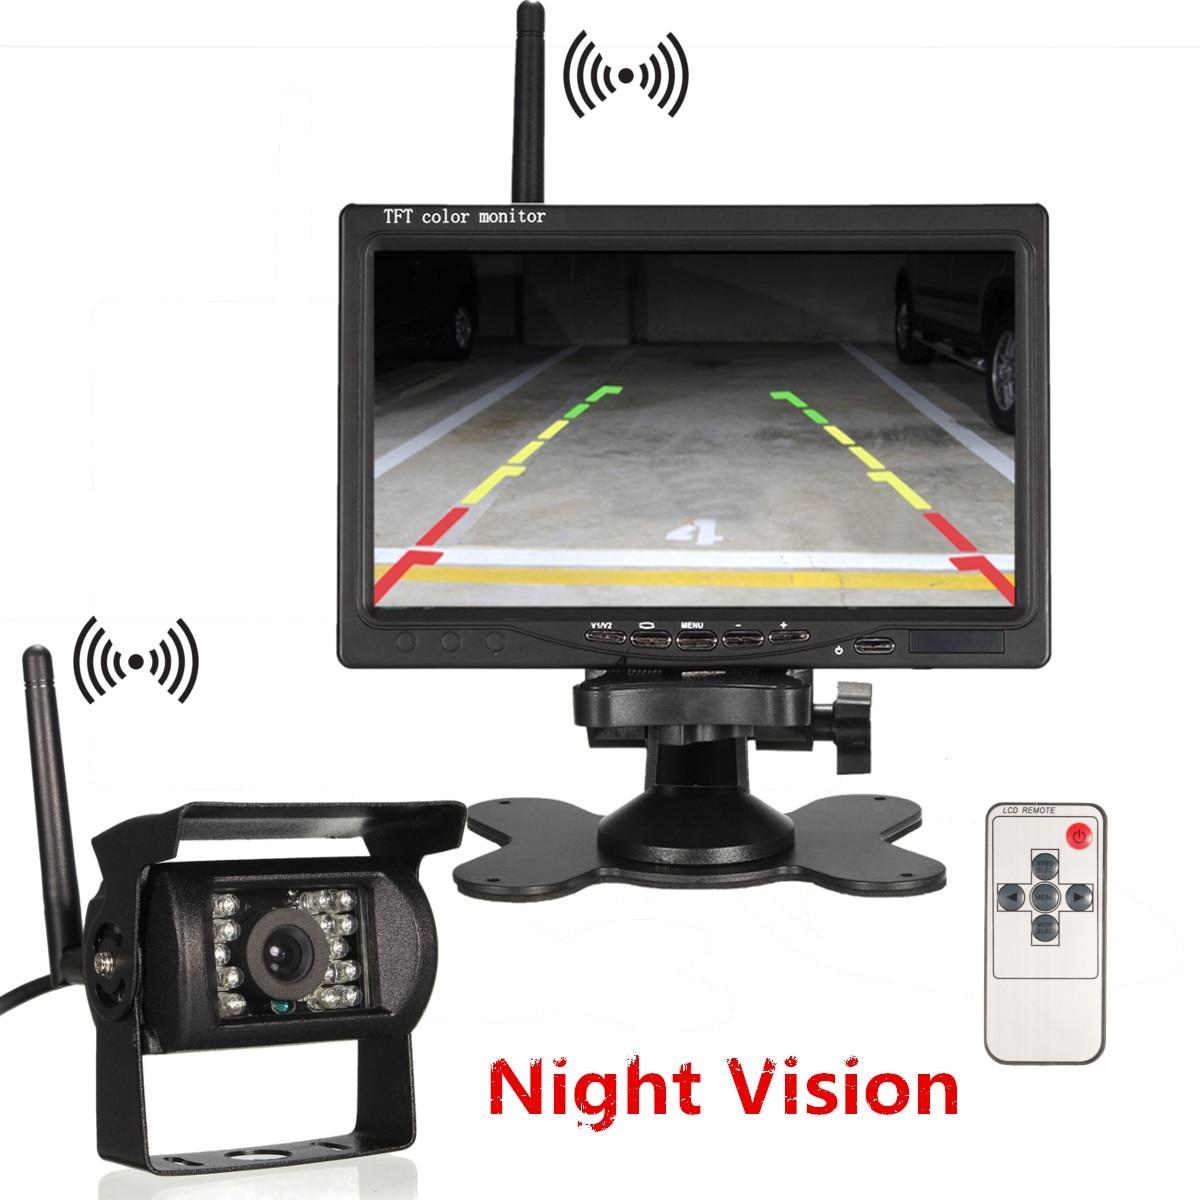 "7 ""bezprzewodowa tylna kamera samochodowa HD Truck Camera System parkowania 7"" Monitor TFT LCD do autobusu RV Van rewers Backup Night Vision"